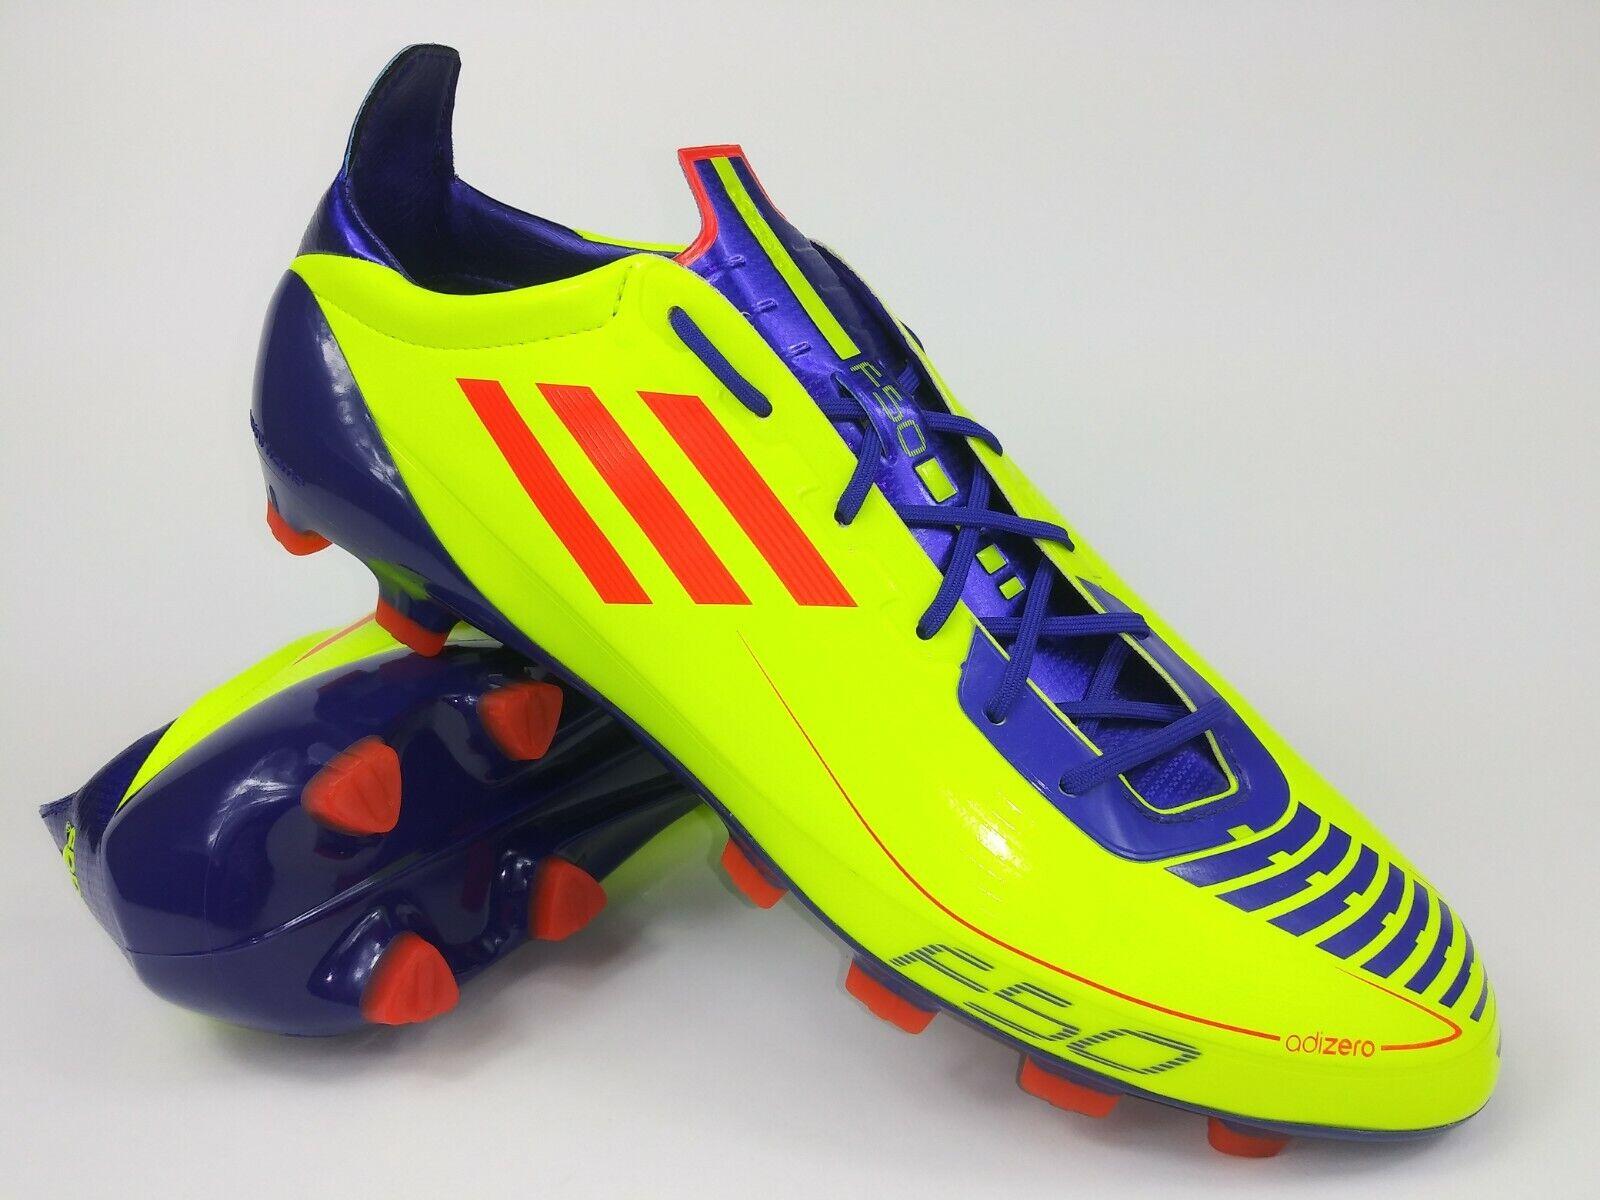 adidas F50 Adizero FG Football BOOTS